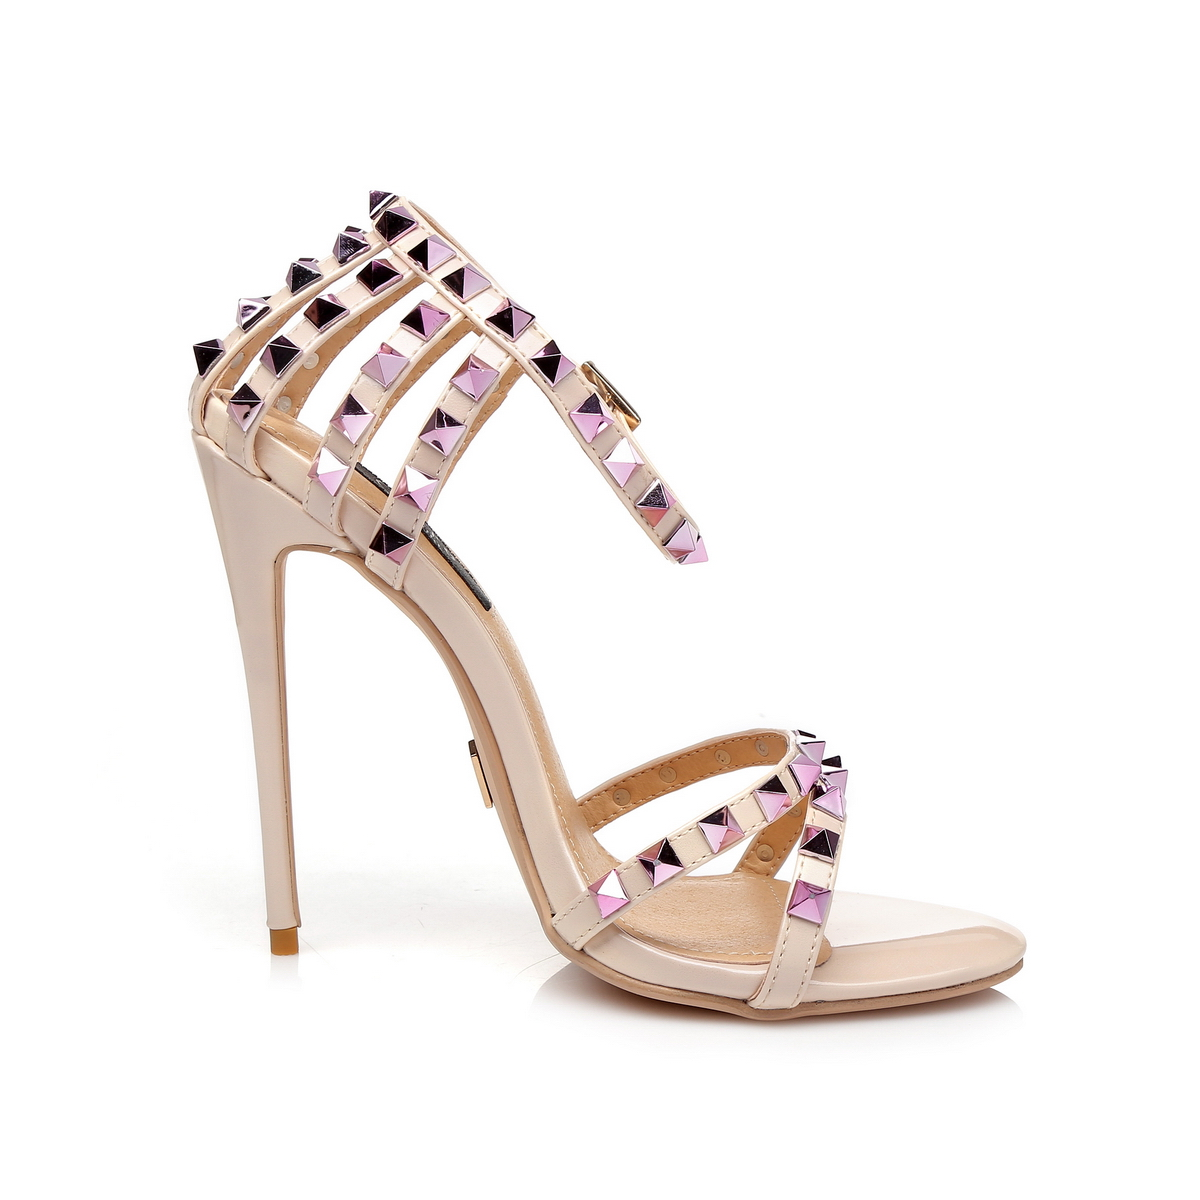 GIARO - Damen High Heel Sandalatten - Hautfarbend Schuhe in Übergrößen – Bild 4